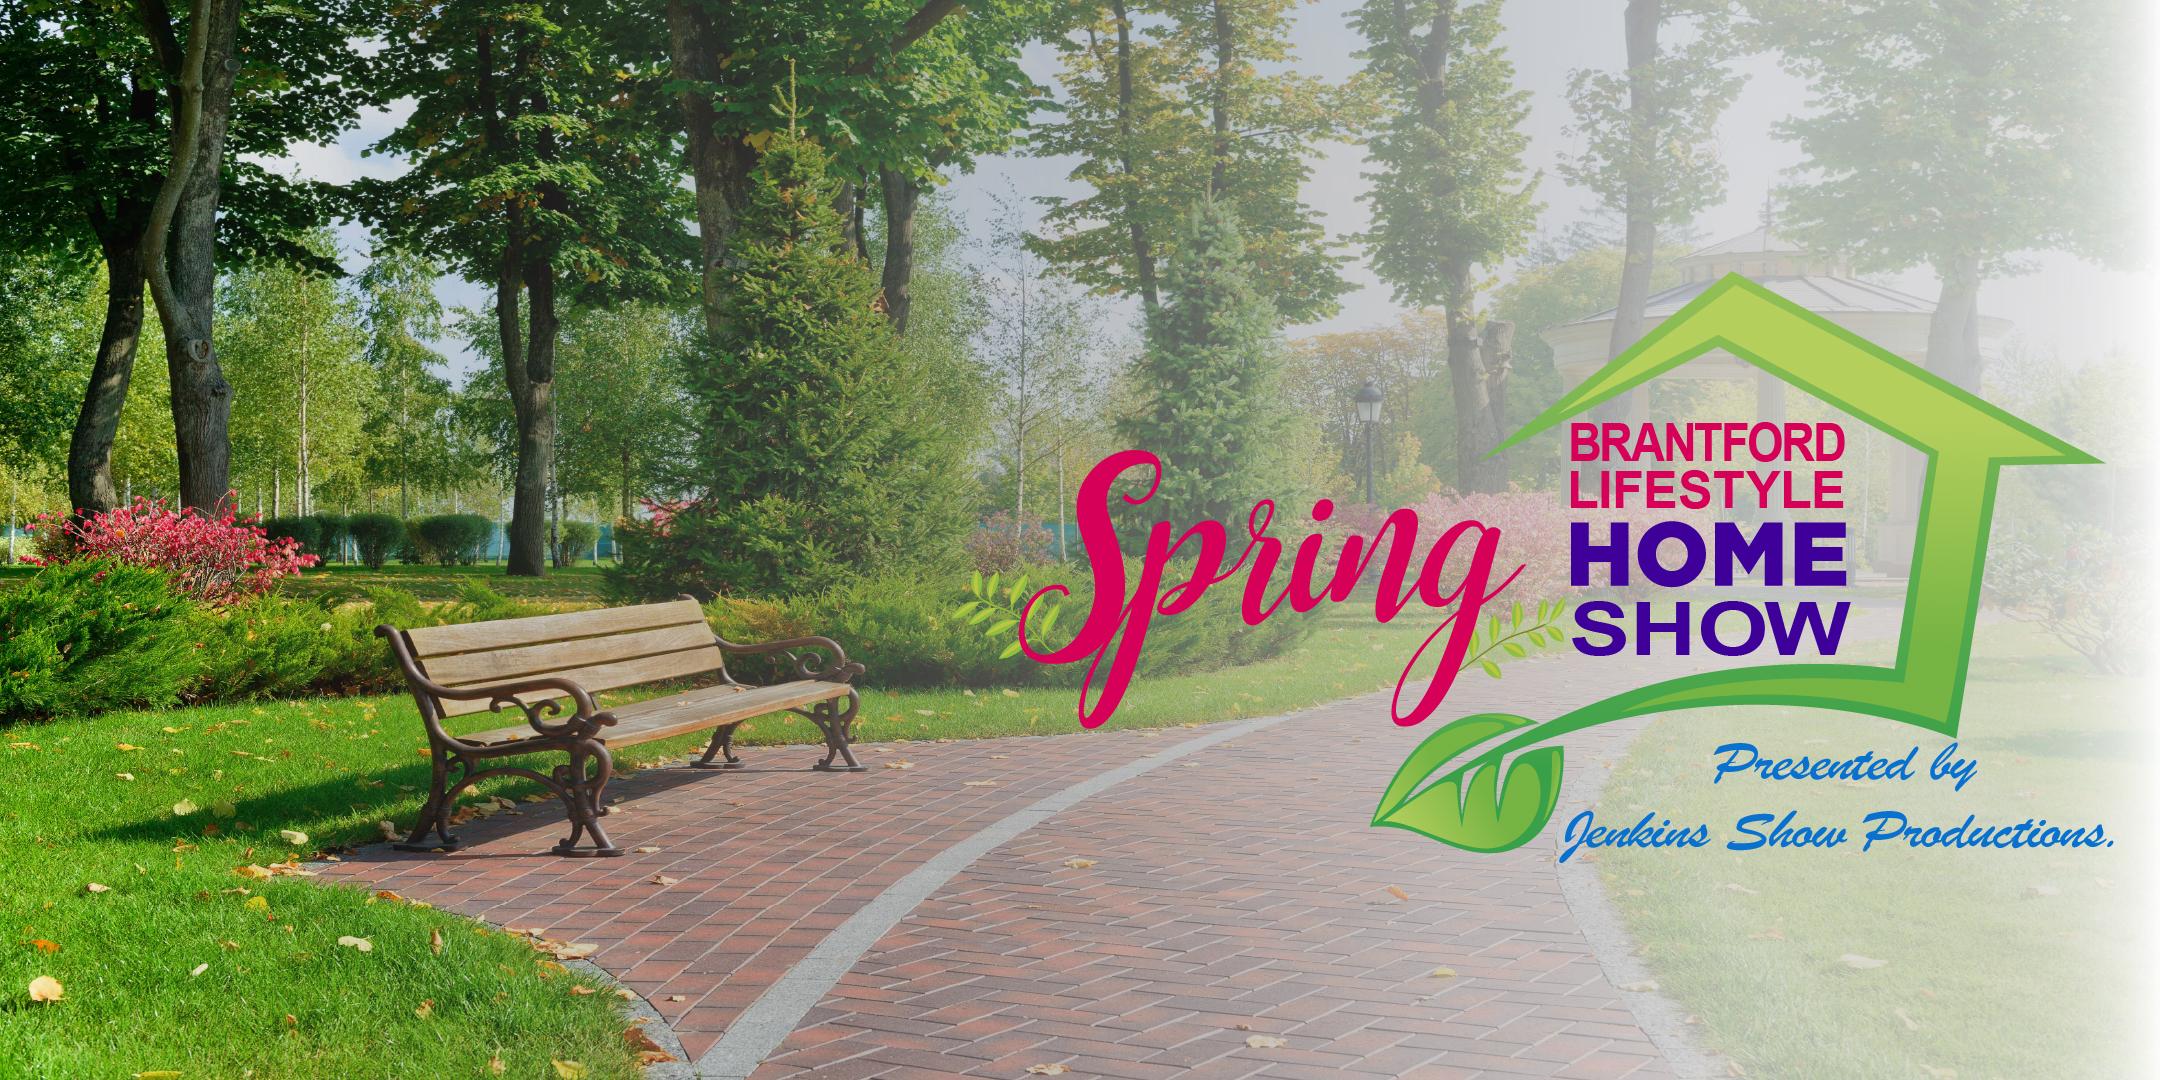 Brantford Lifestyle Spring Home Show image